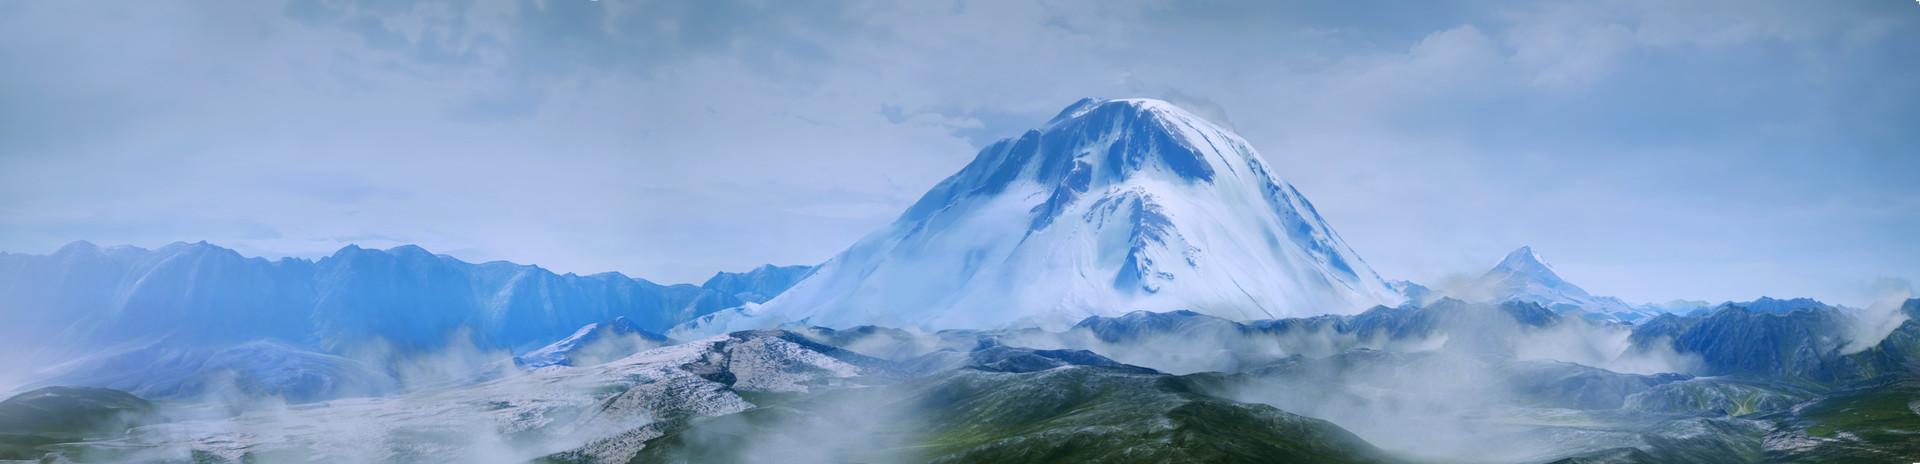 Arechiga_PNW Volcano